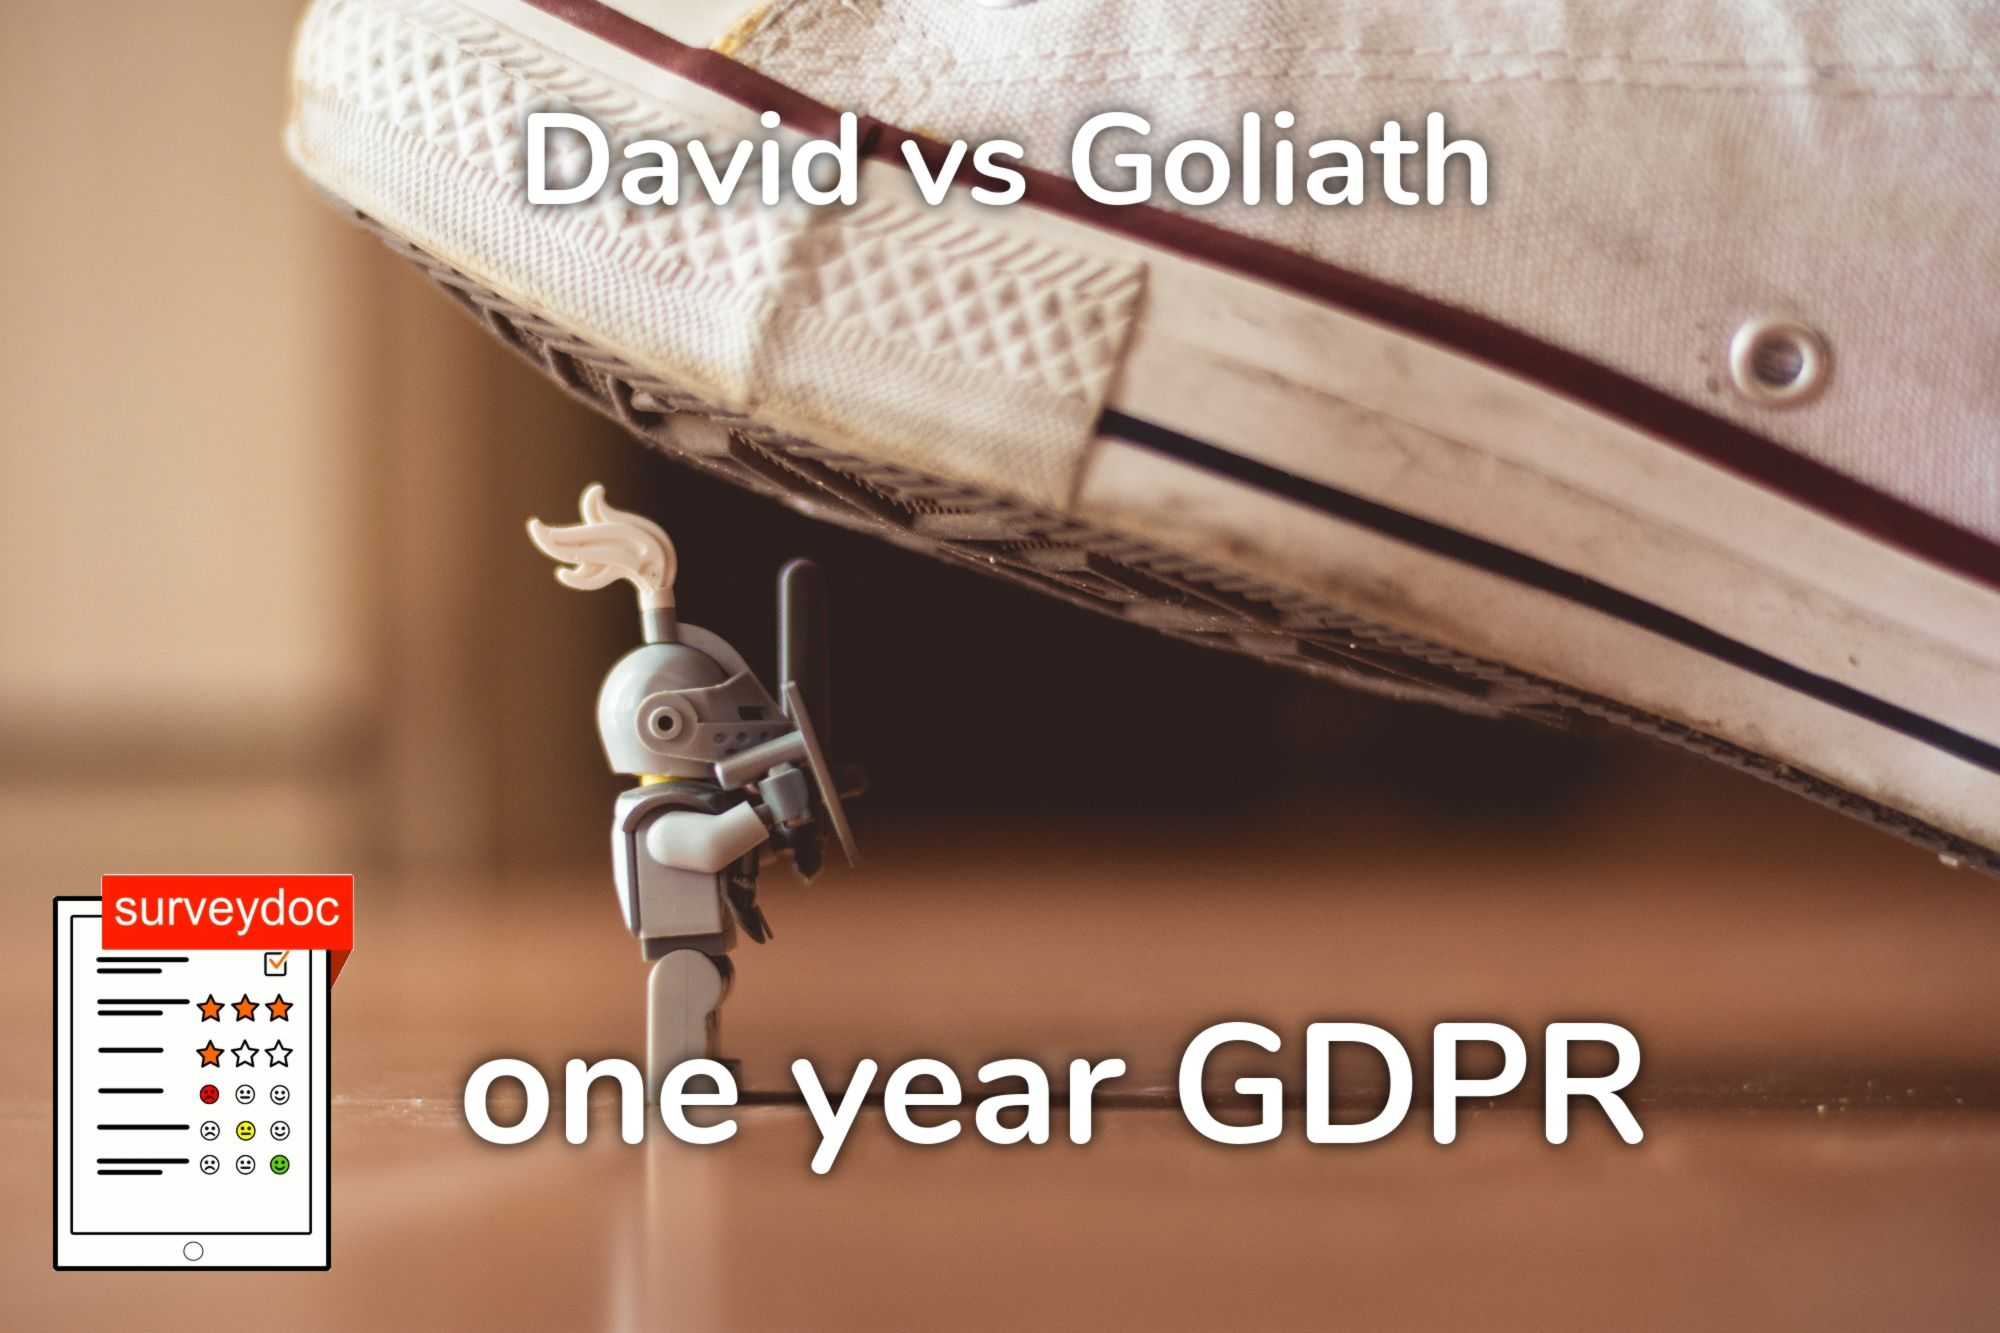 online survey tool surveydoc wins customer because of GDPR